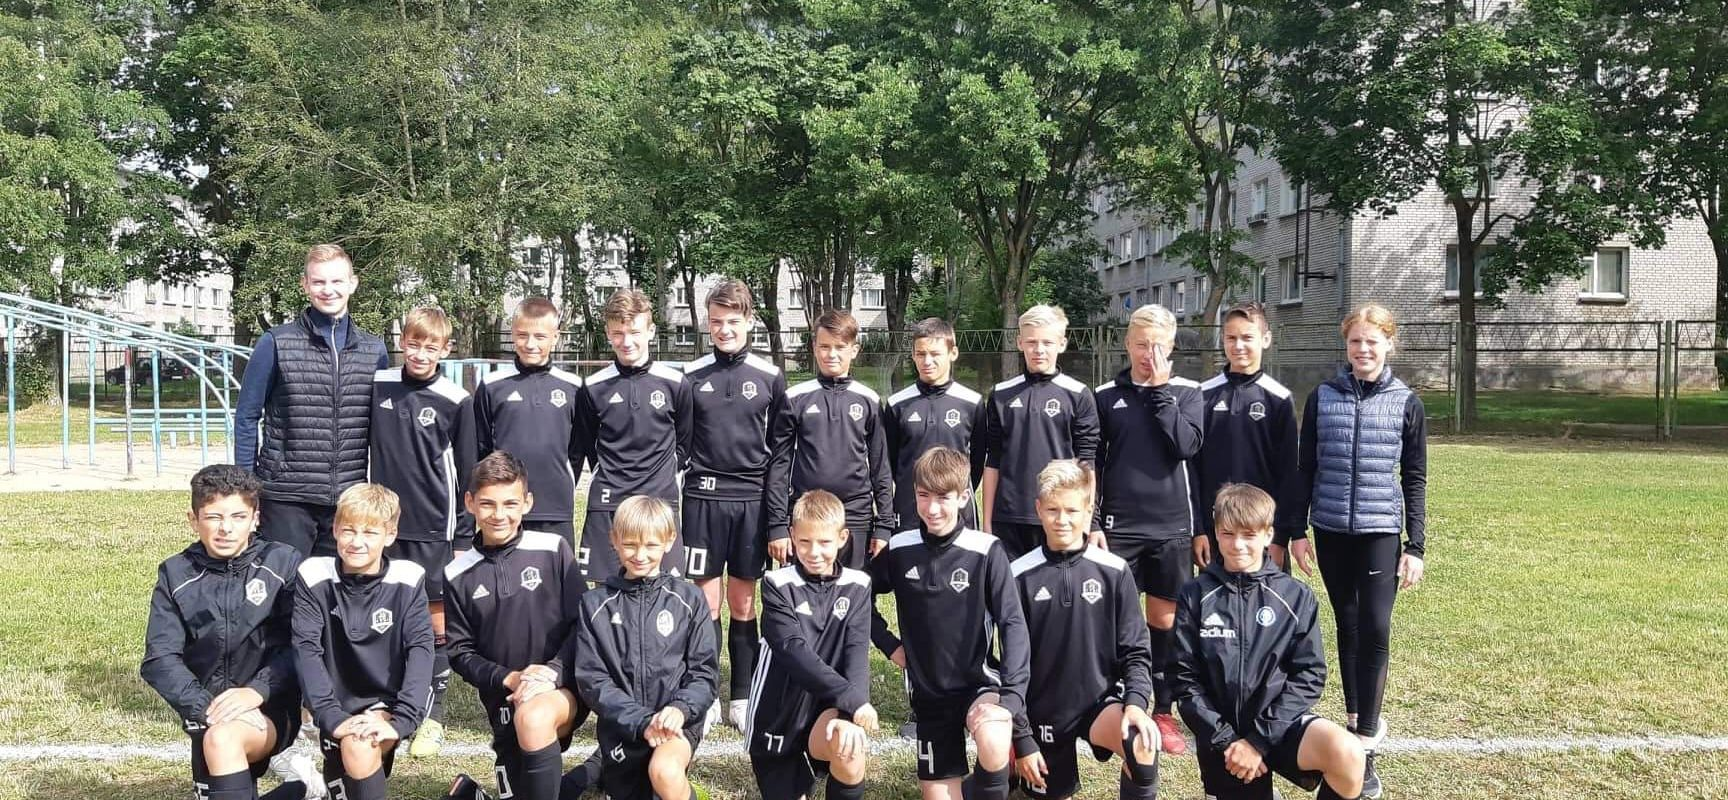 FC Tallinn 2006 и 2007: футбольный лагерь в Cилламяэ